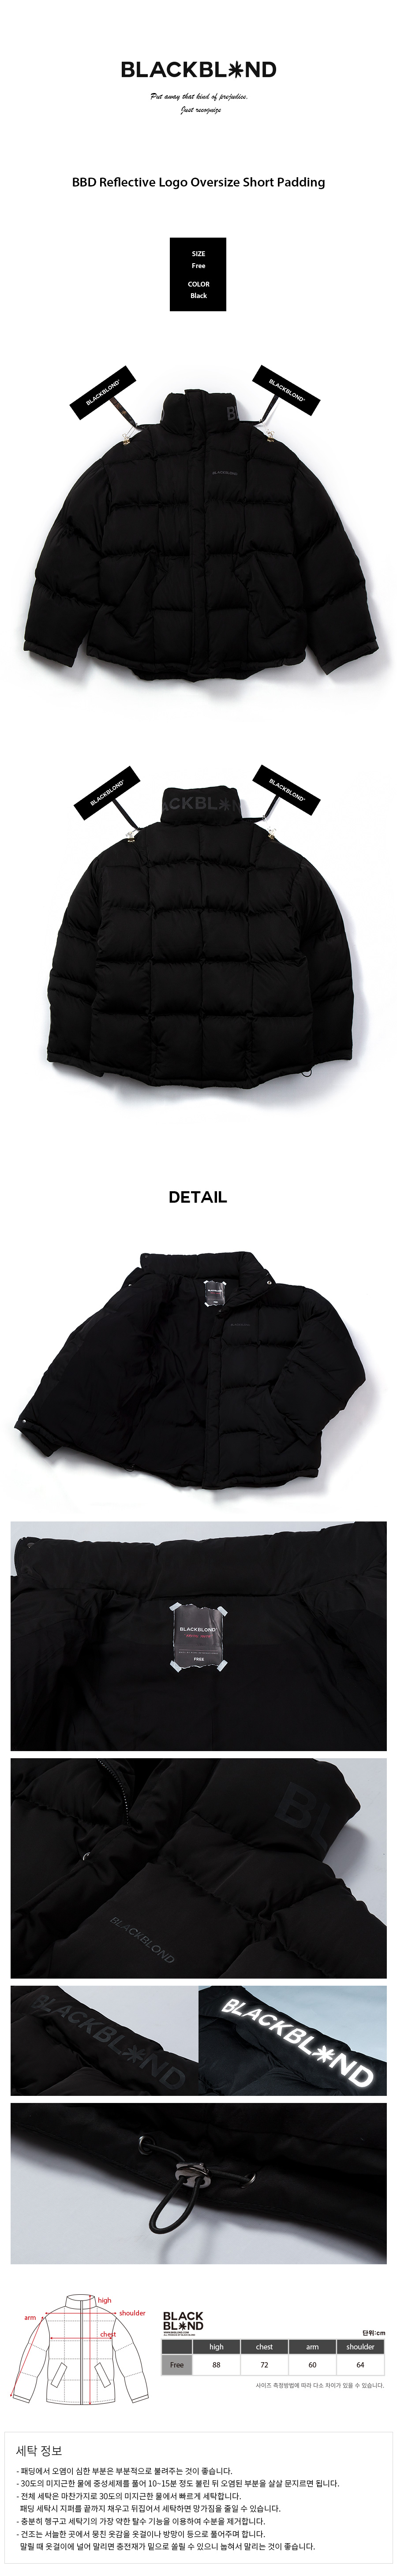 BBD-Reflective-Logo-Oversize-Short-Padding-%28Black%29.jpg